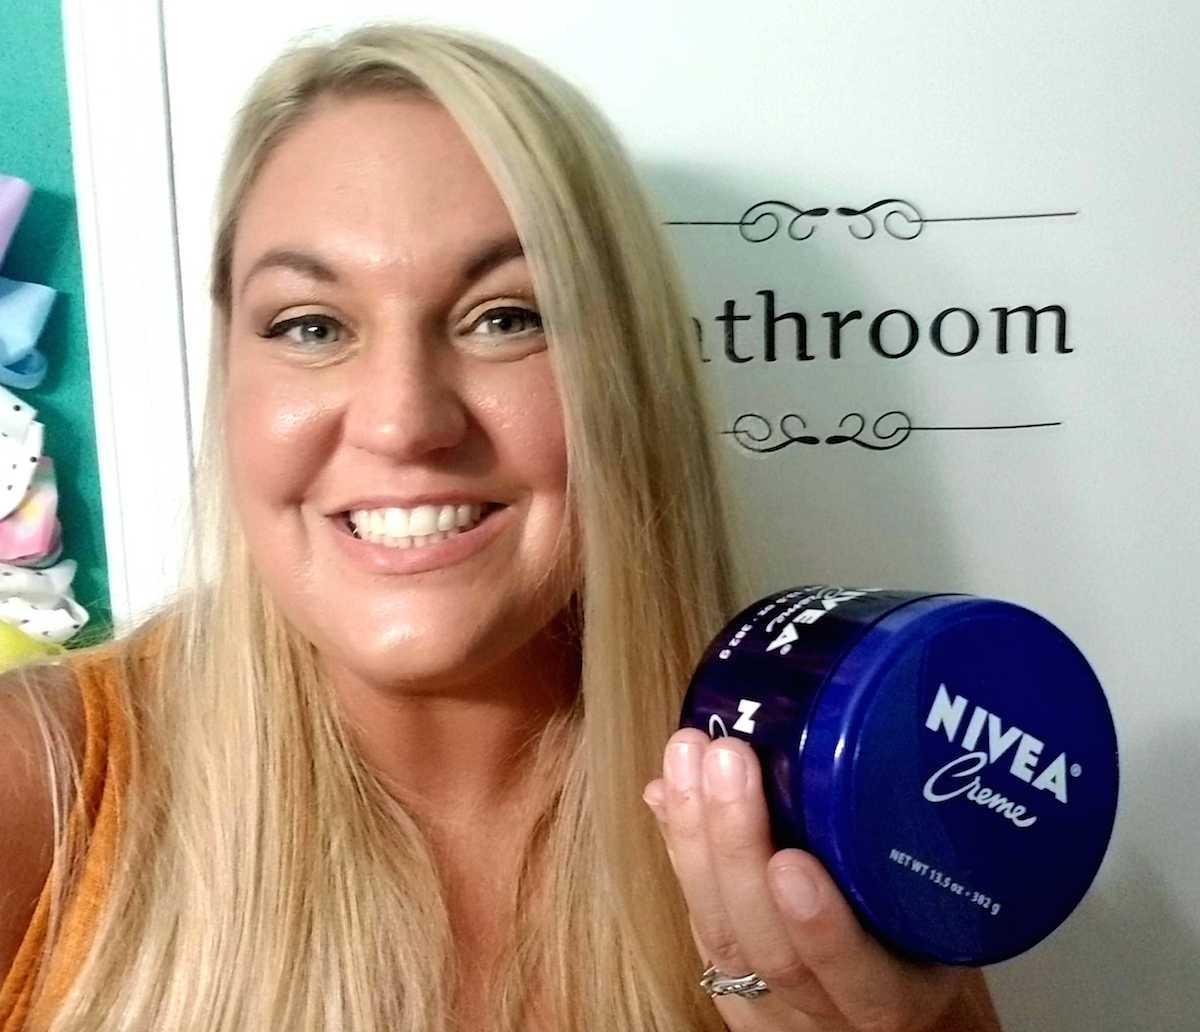 woman holding blue jar of NIVEA creme